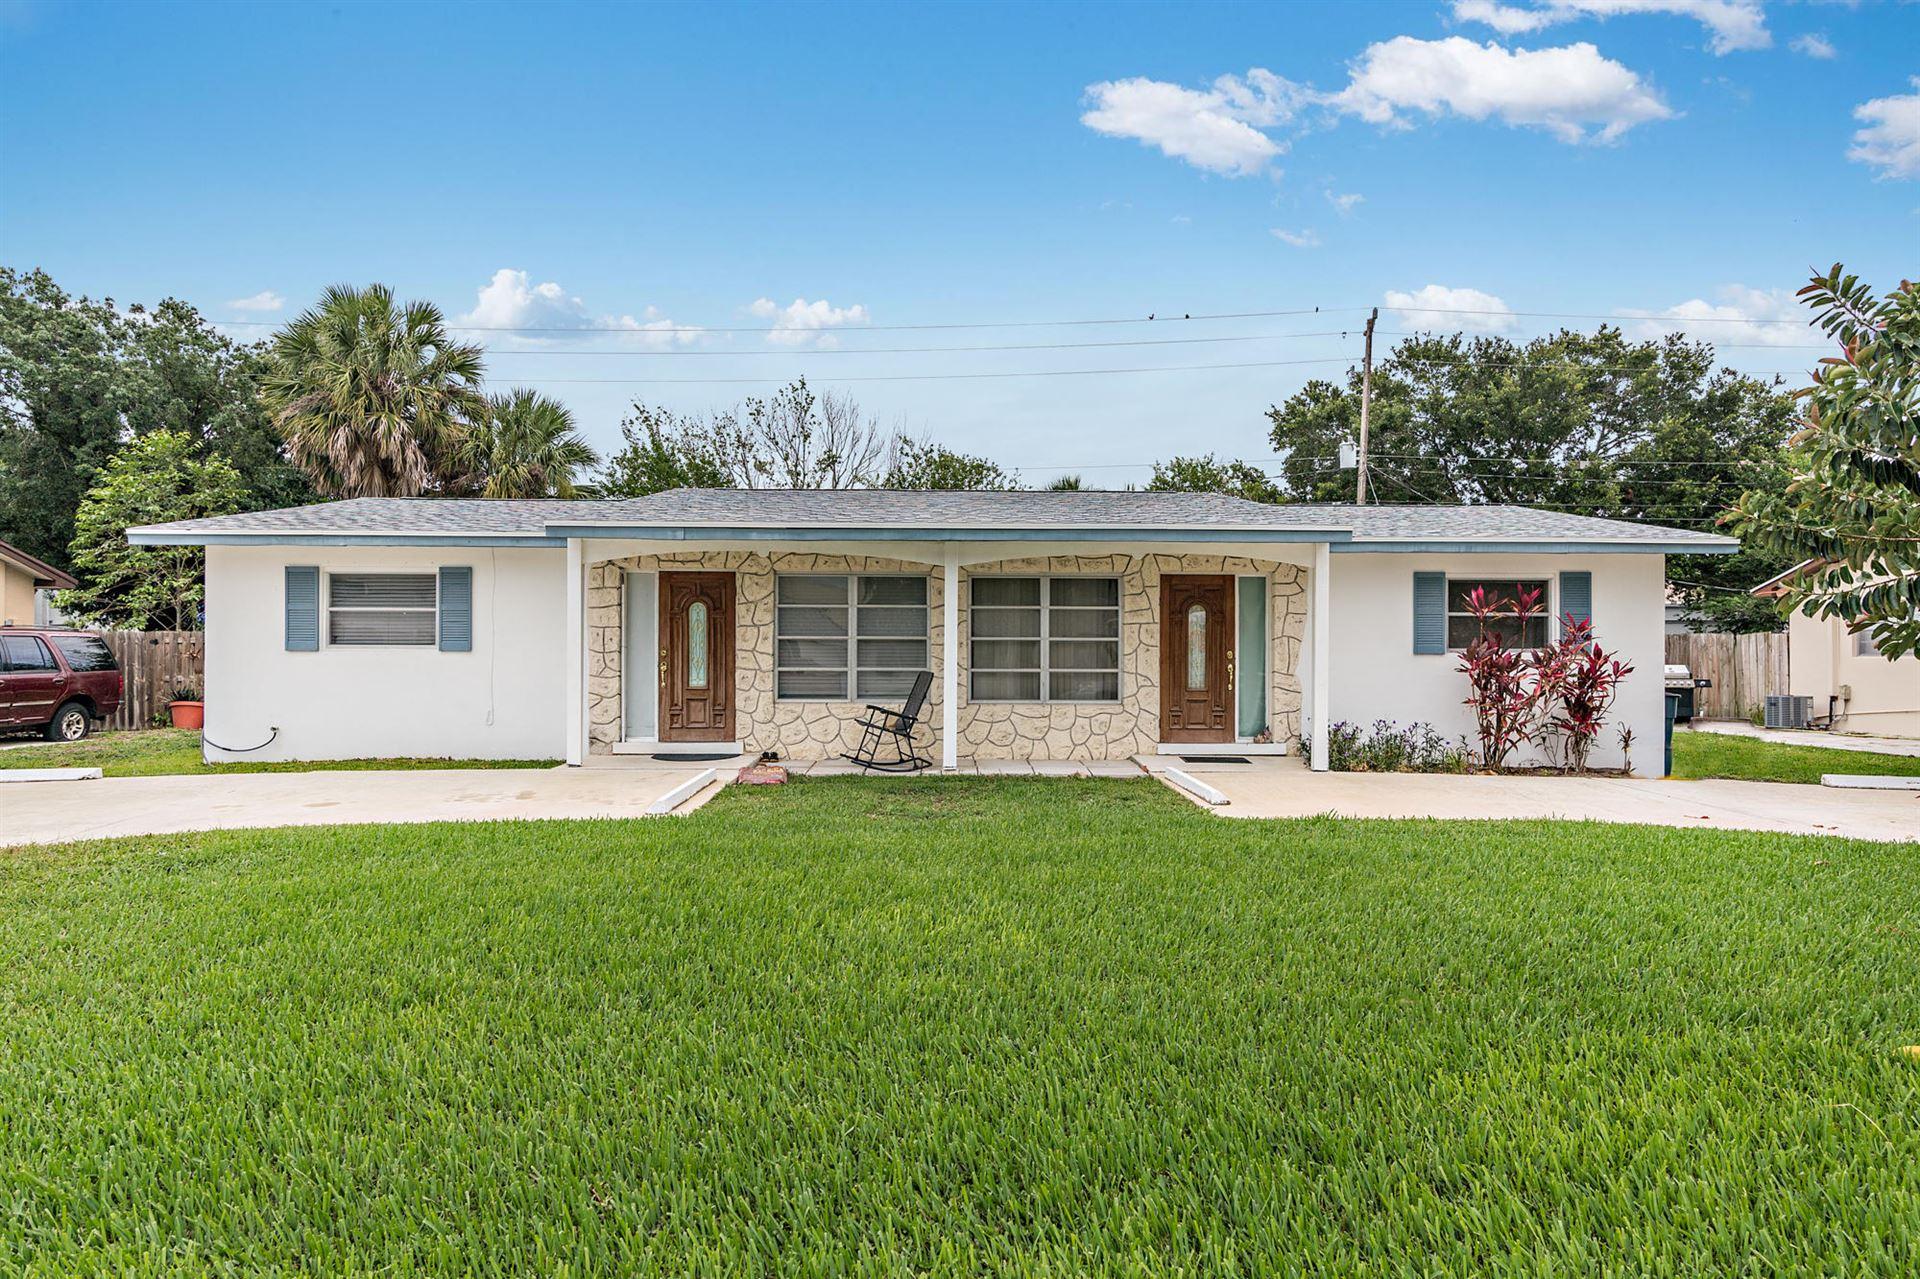 8854 Dania Drive, Palm Beach Gardens, FL 33410 - MLS#: RX-10725877